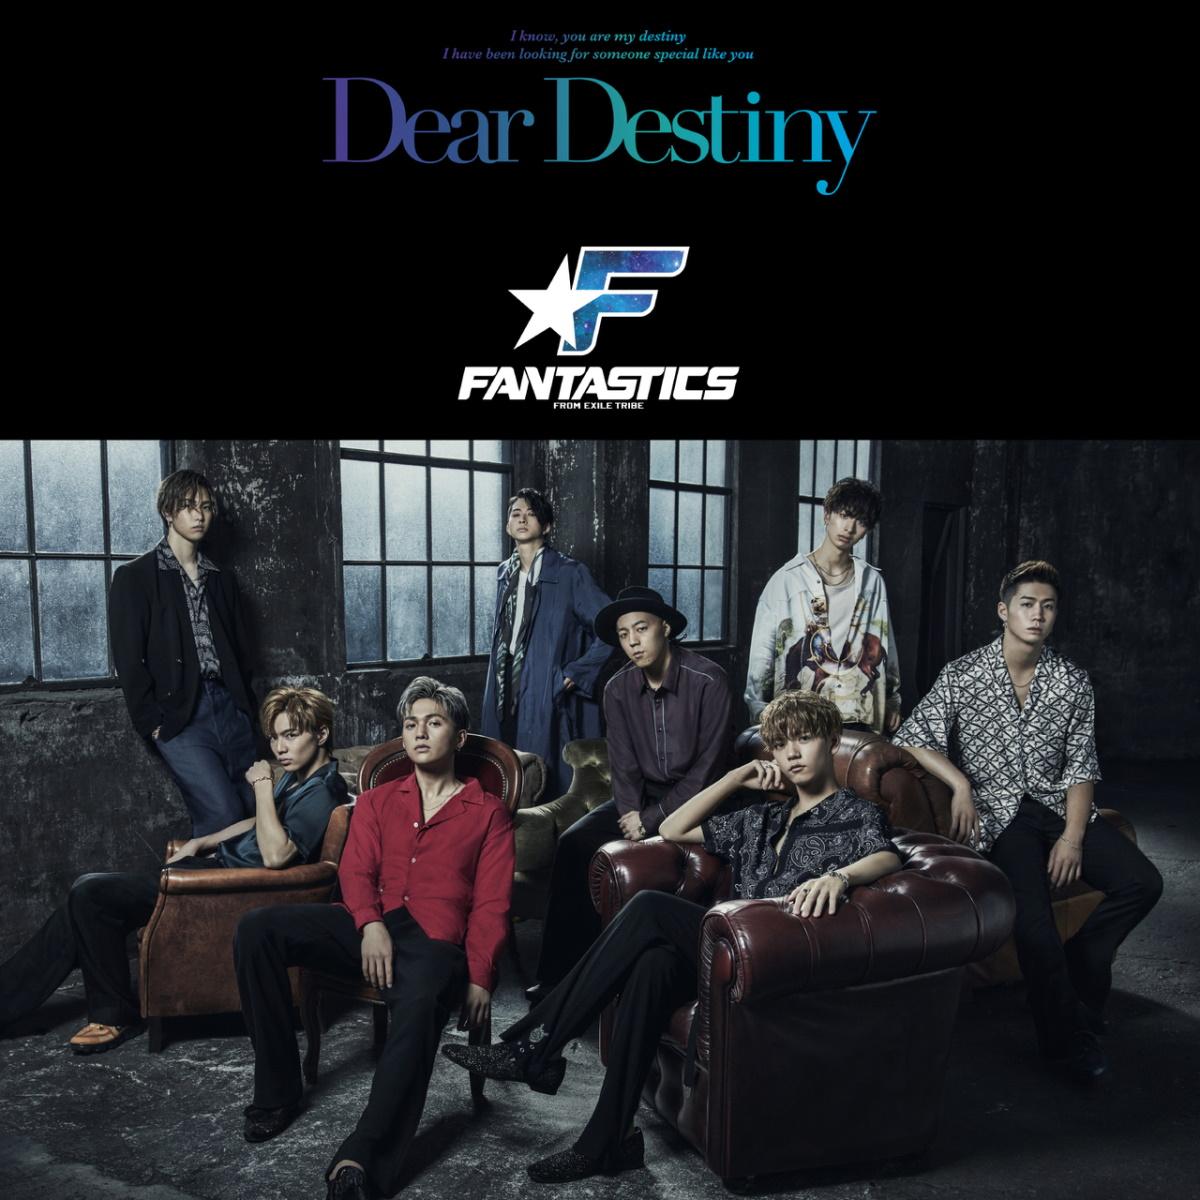 『FANTASTICS from EXILE TRIBE - ターミナル』収録の『Dear Destiny』ジャケット